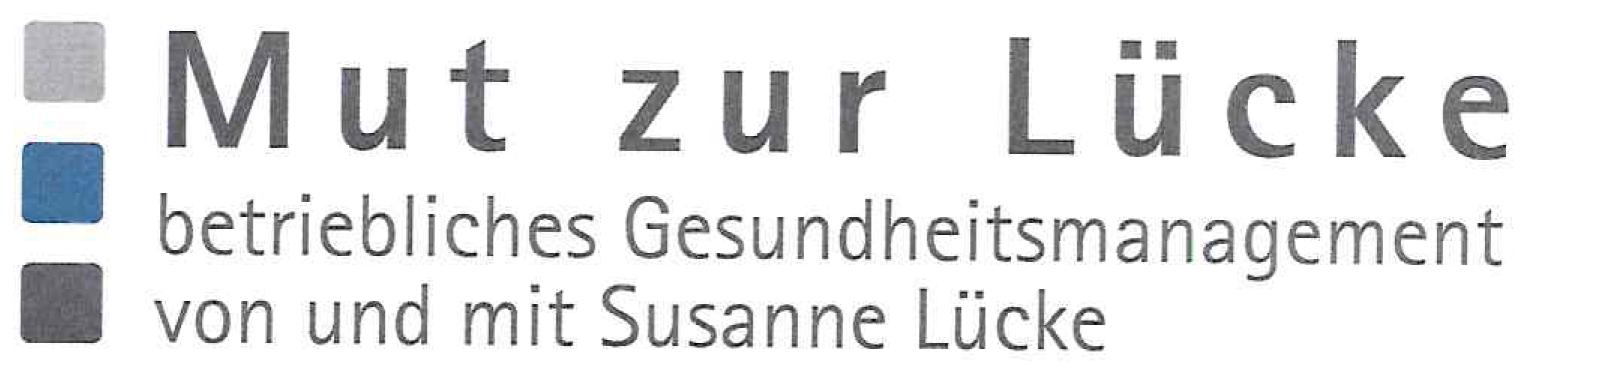 logo_neu-1606x390-mut-zur-luecke_617ba89681b7eee9d7a4c4fb8abe660b